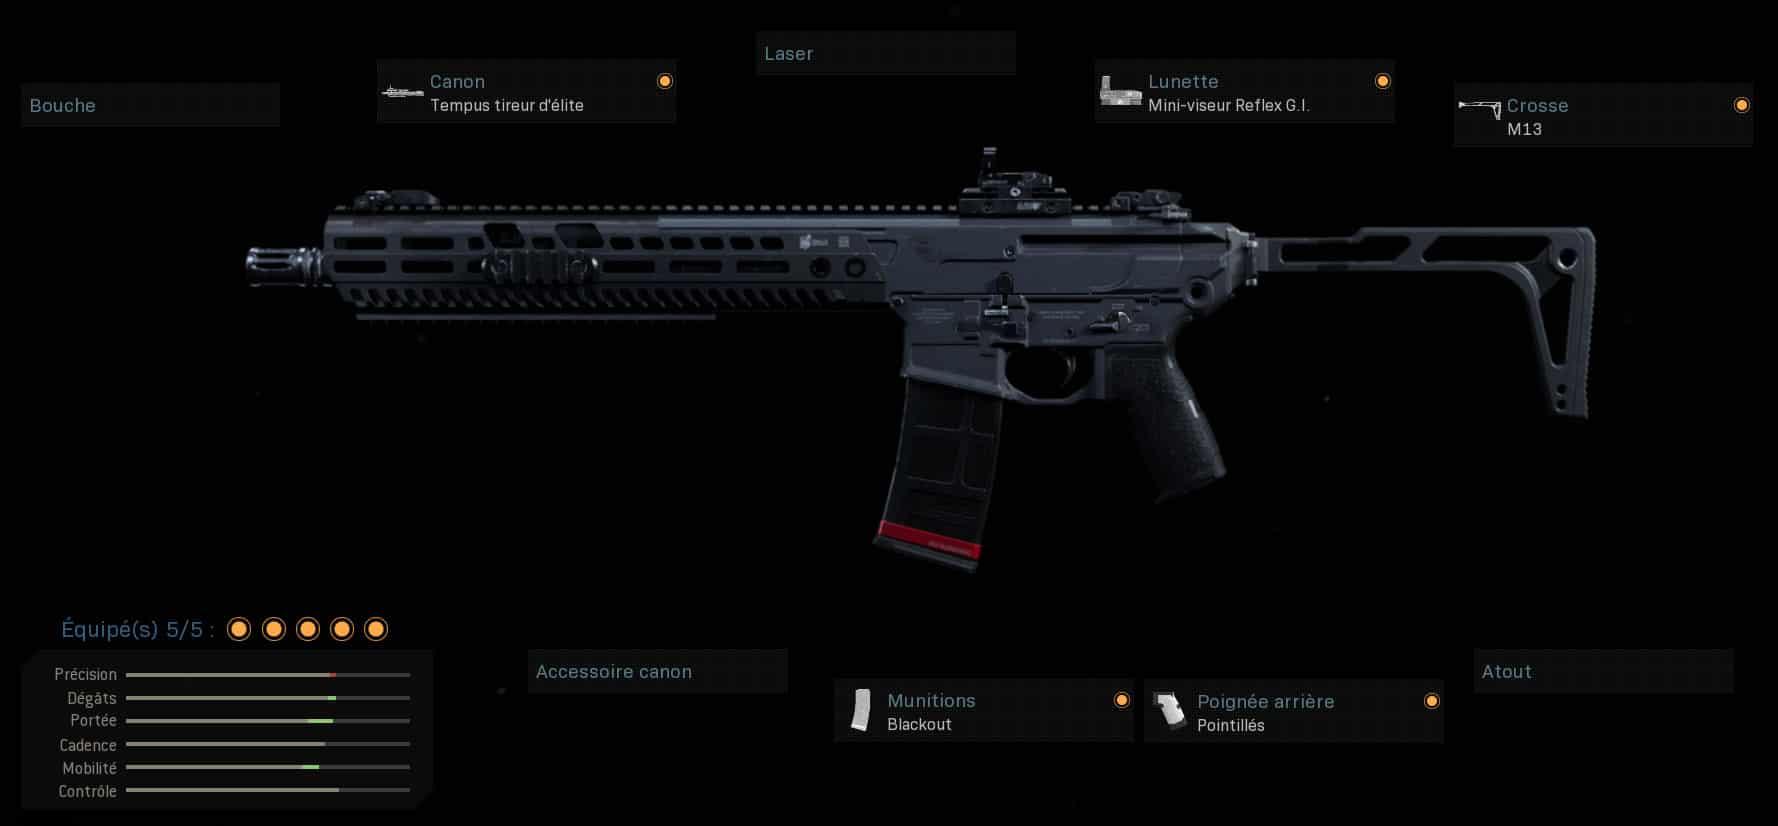 cod-call-of-duty-modern-warfare-M13-meilleurs-loadout-attachments-mod-2